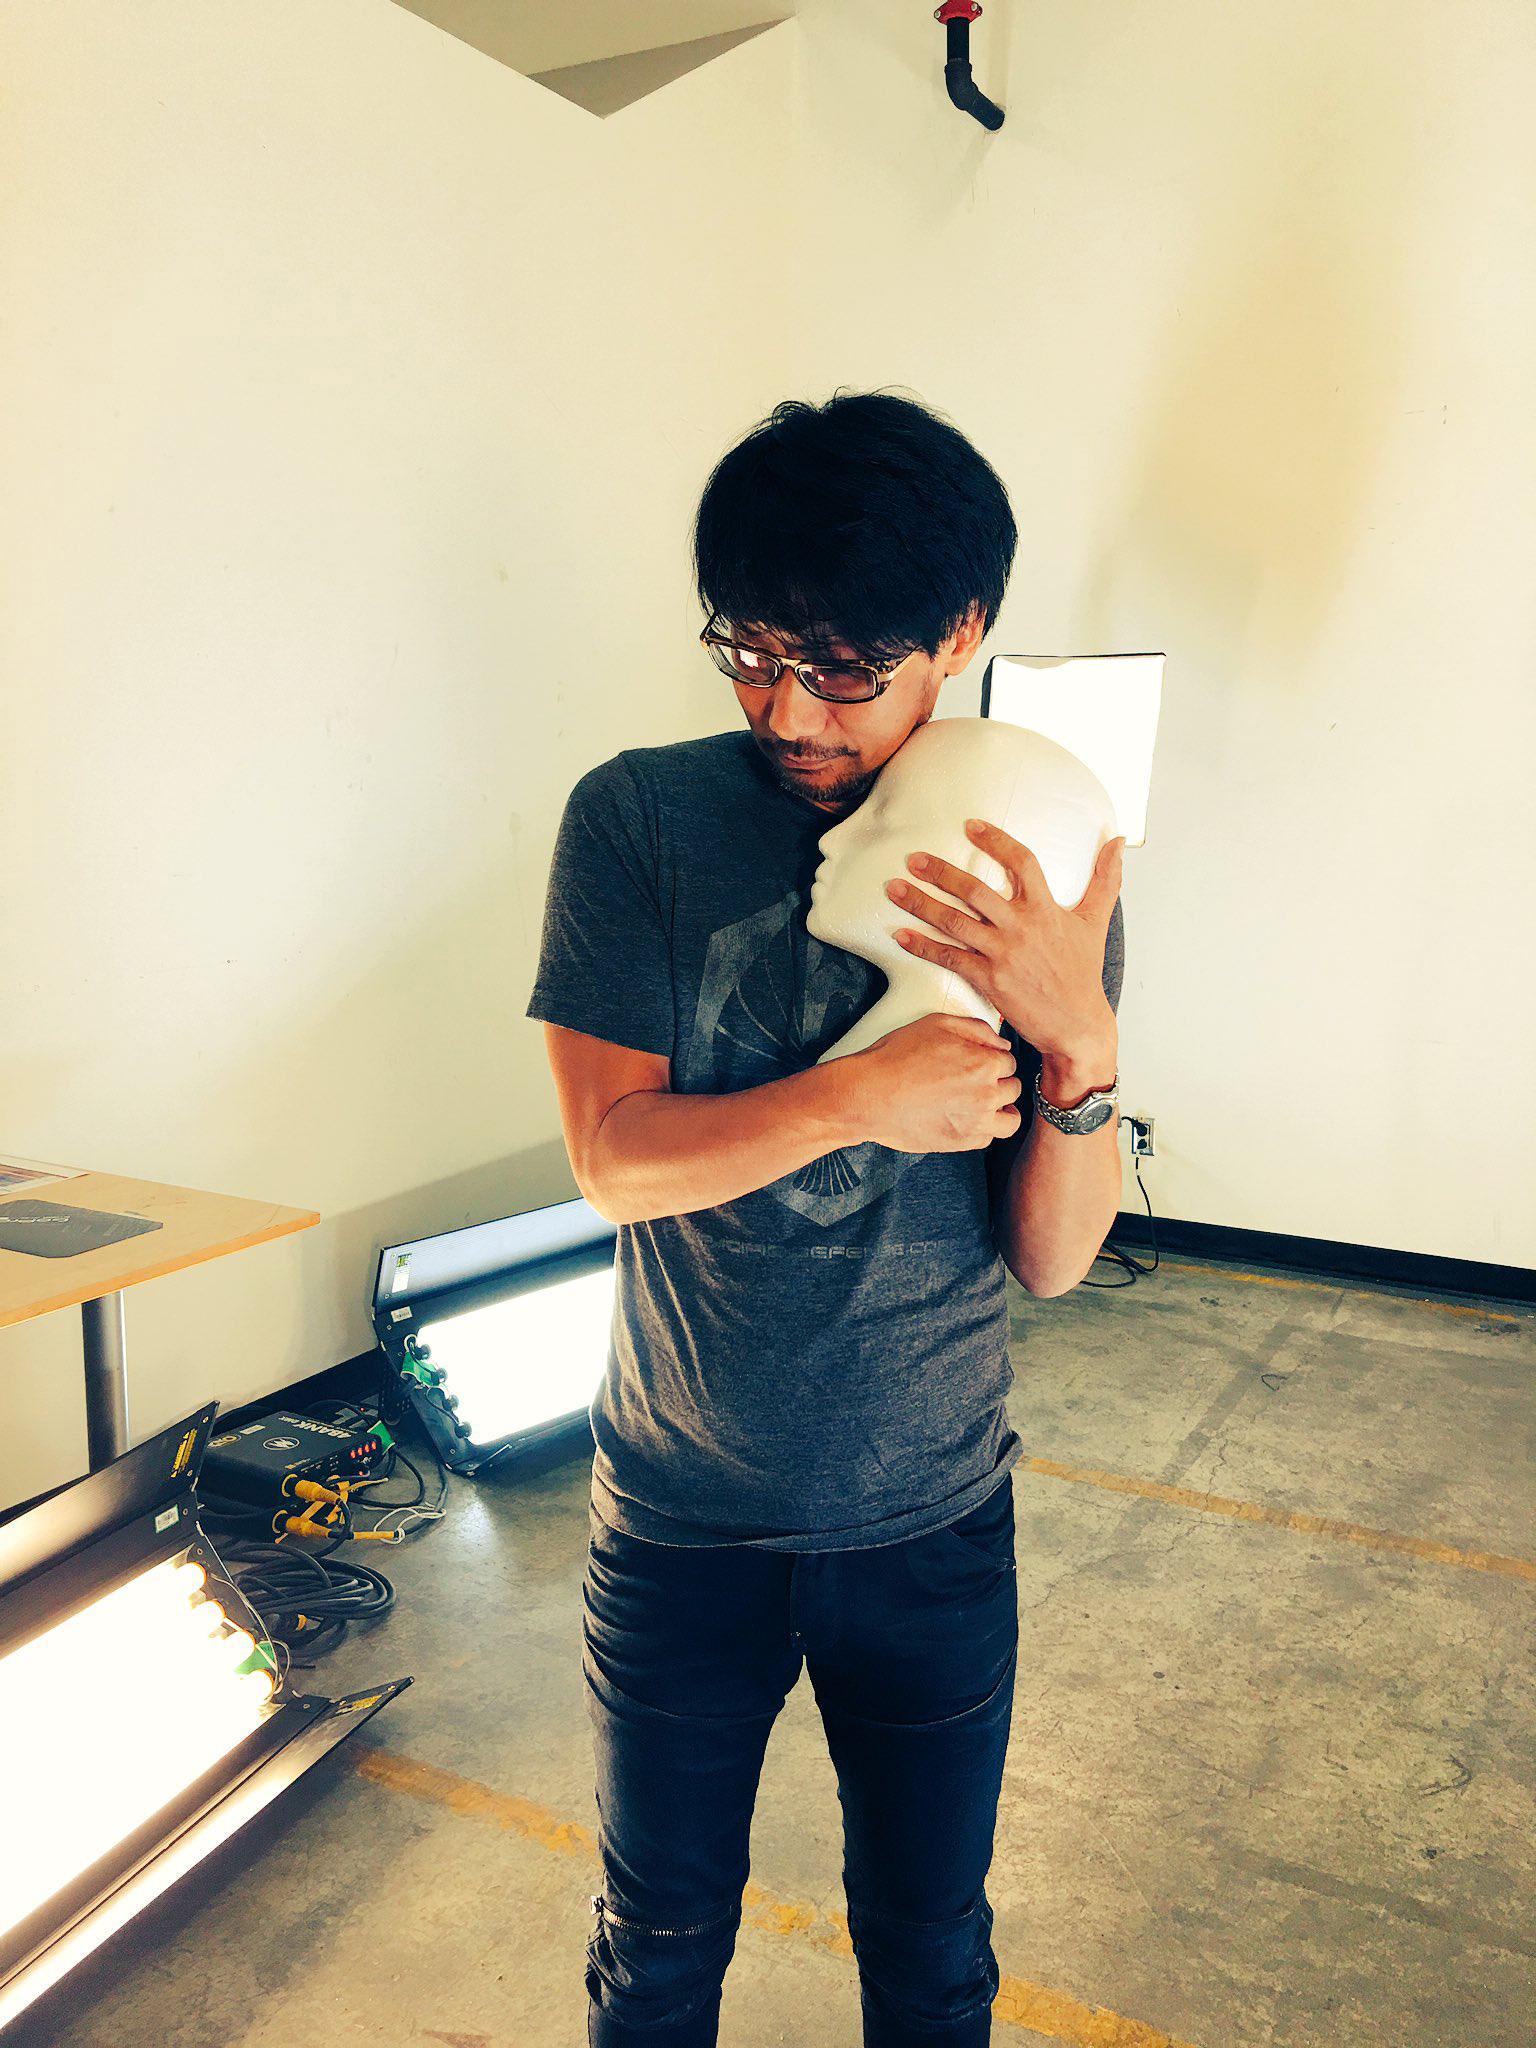 kojima-3d-scanning-studio-september-2016-head